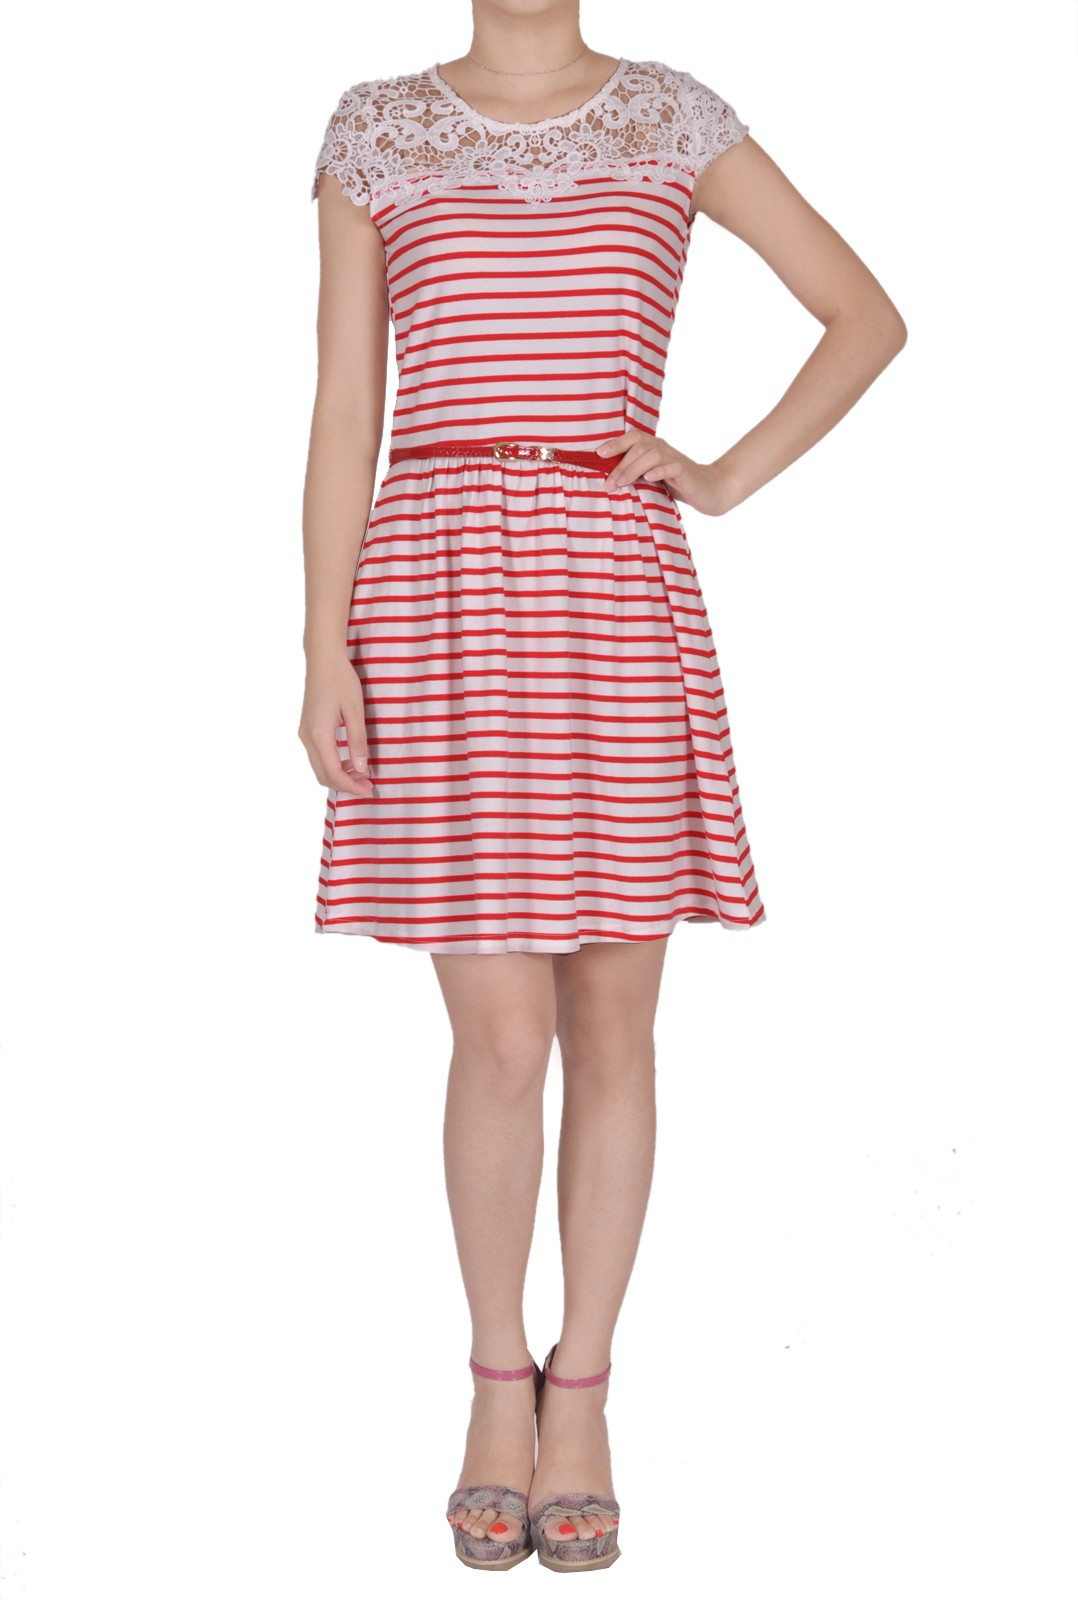 5b7d229f7913 cute φόρεμα κροσέ nautical ριγέ σε κόκκινο/εκρού